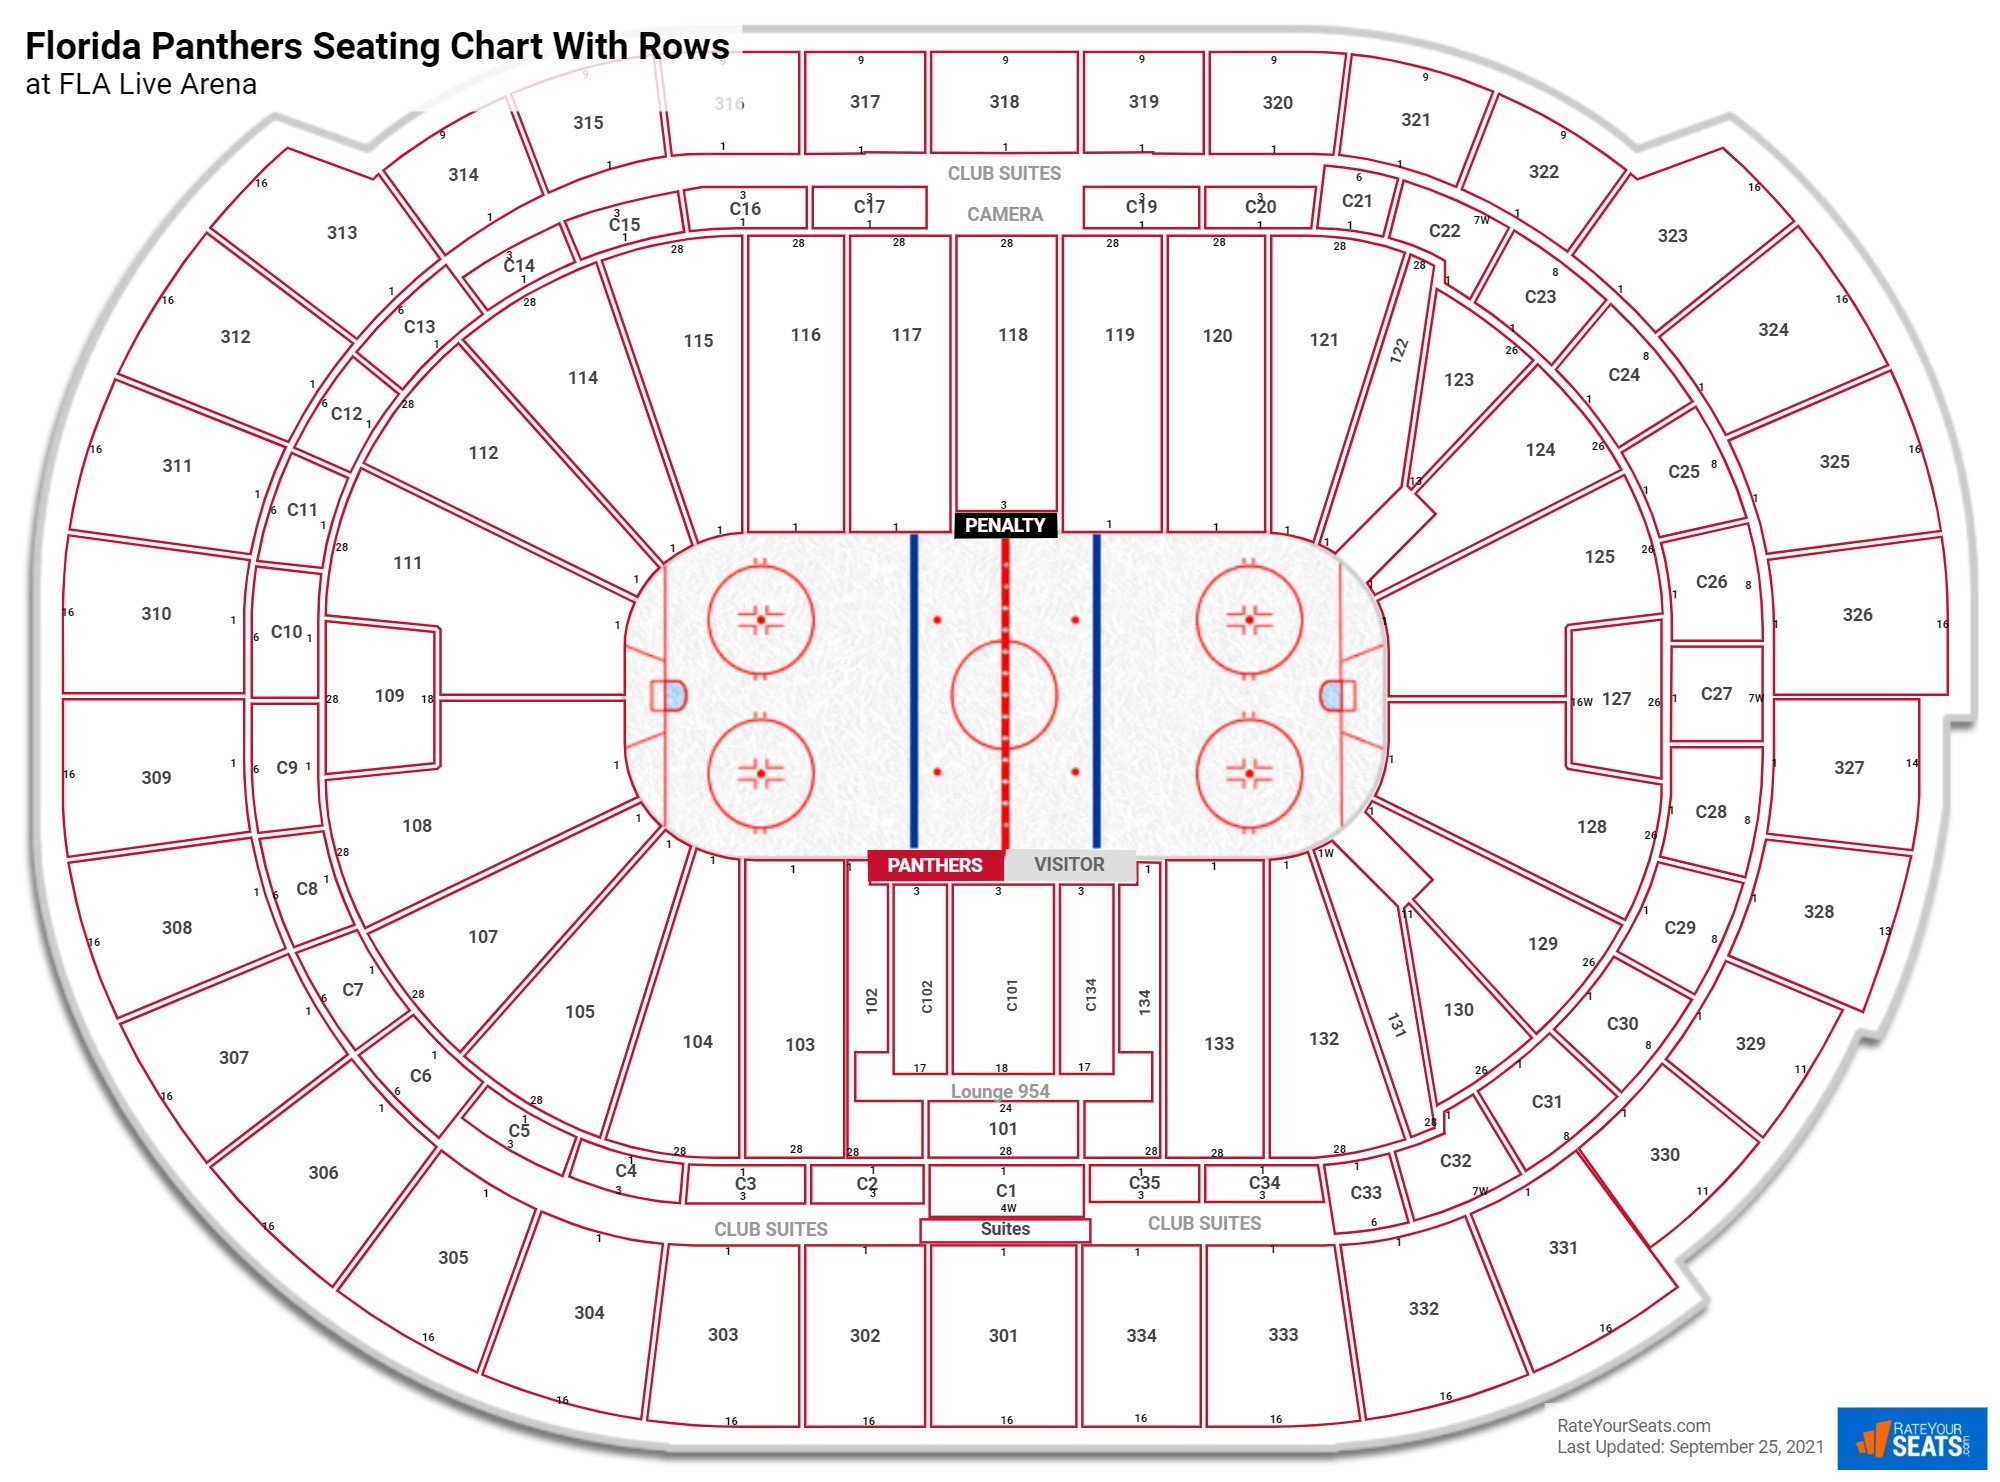 Florida Panthers Seating Charts at BB&T Center ...